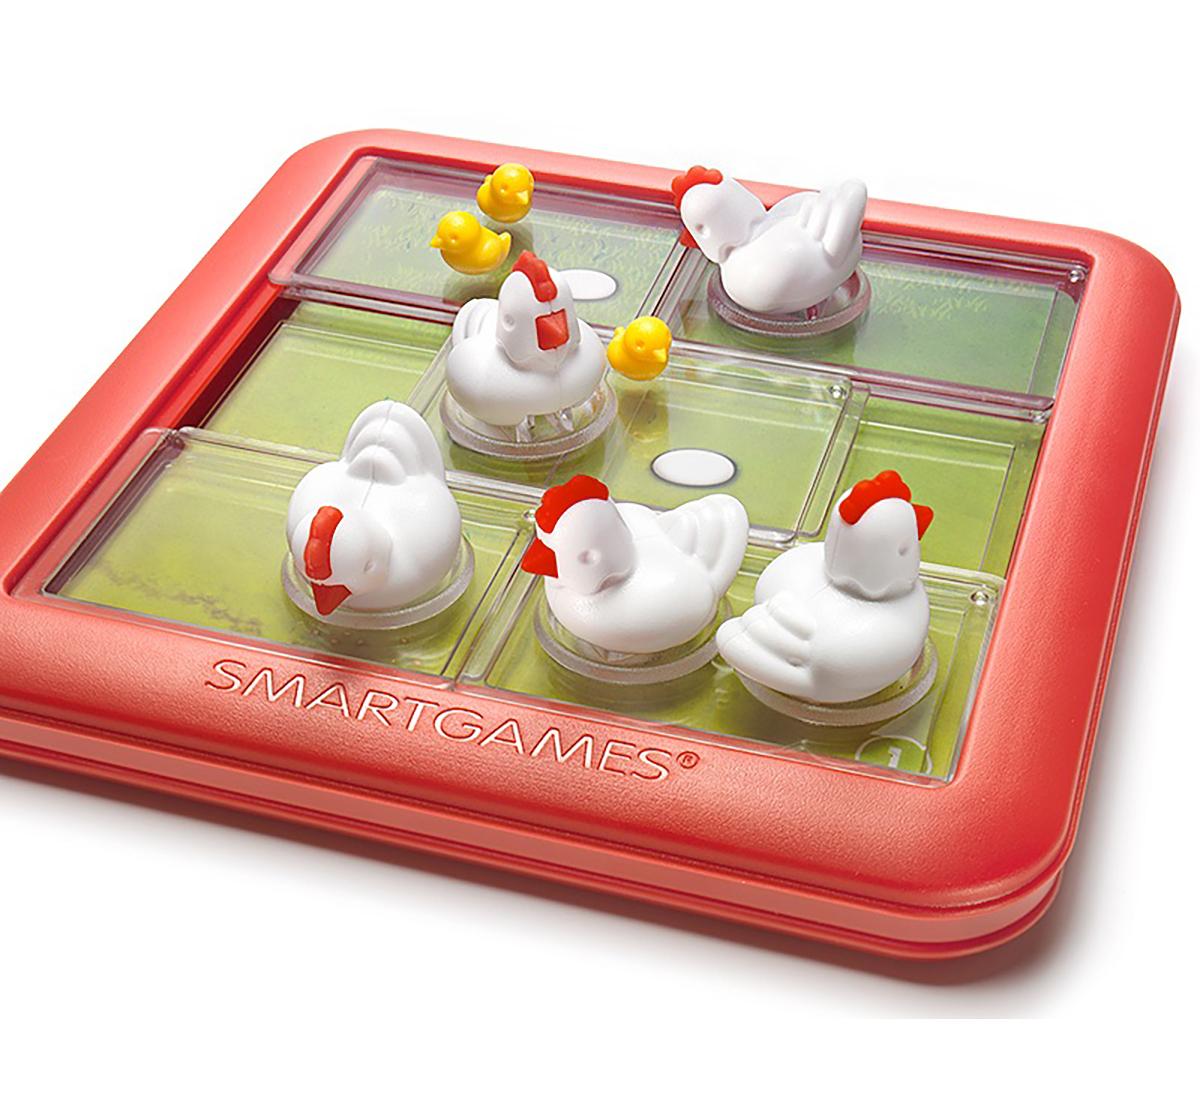 Smart Games    Smart Games Chicken Shuffle Junior for Kids age 4Y+